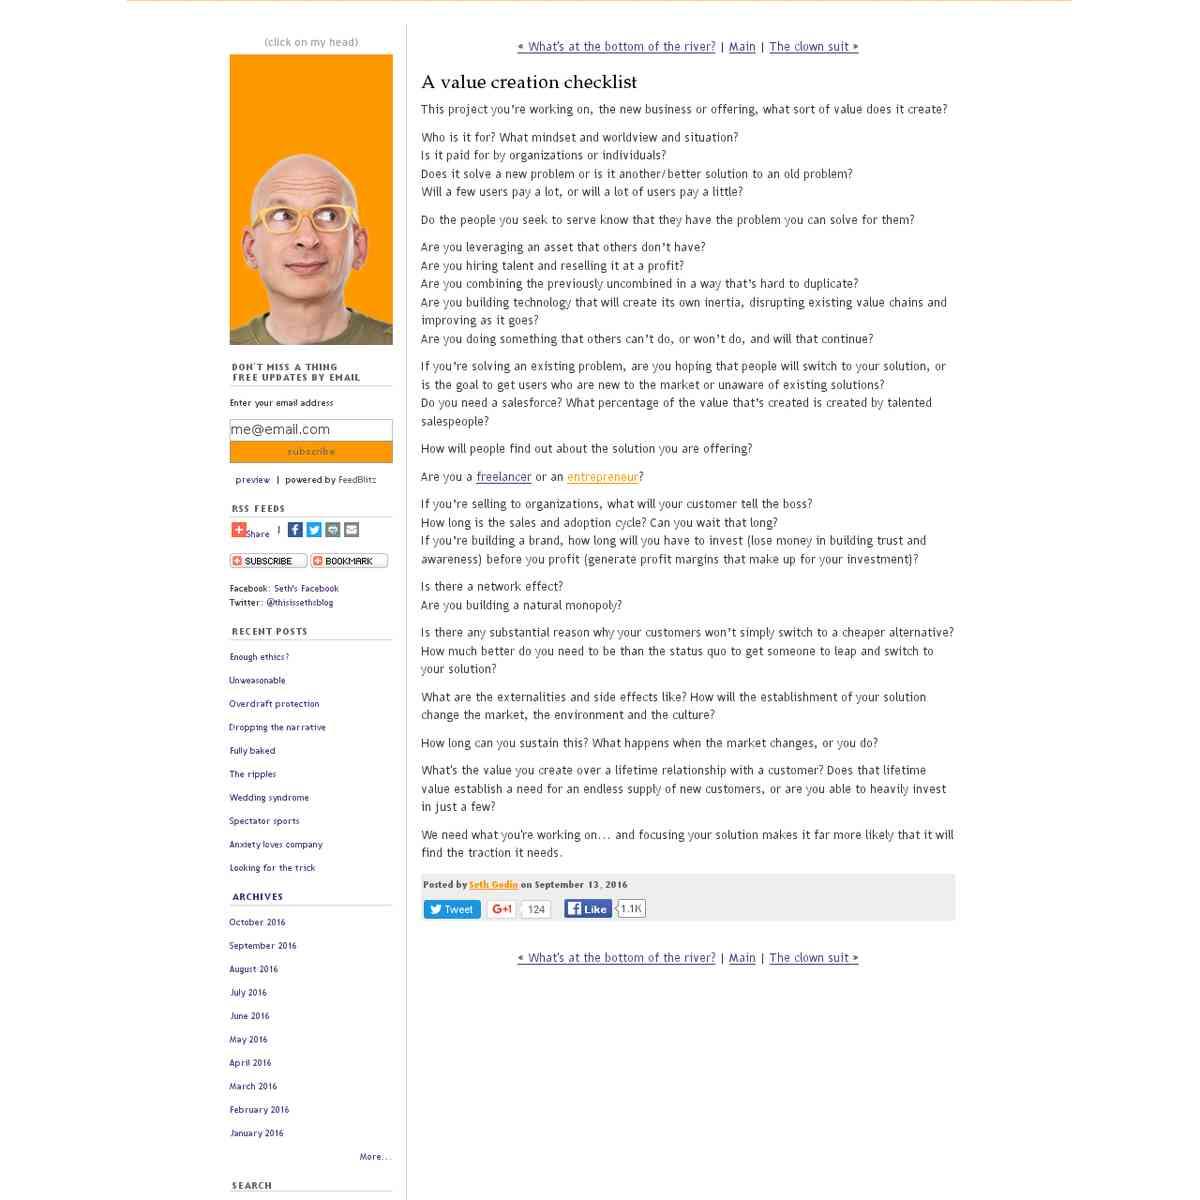 Seth's Blog: A value creation checklist